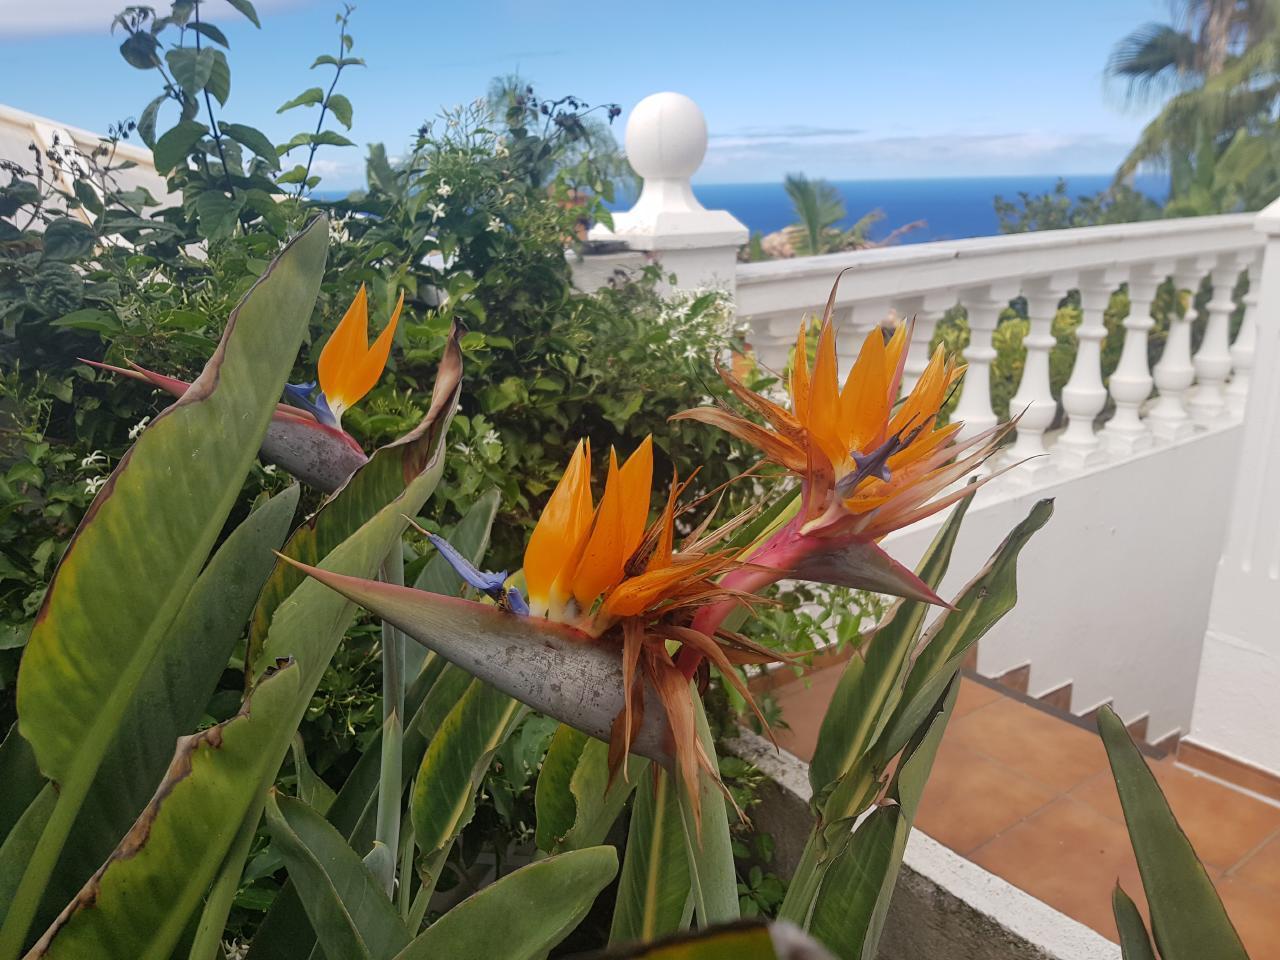 Appartement de vacances Villa Larnia Familien Apartment   * Urlaub für Körper, Geist und Seele * (2529406), El Sauzal, Ténérife, Iles Canaries, Espagne, image 19